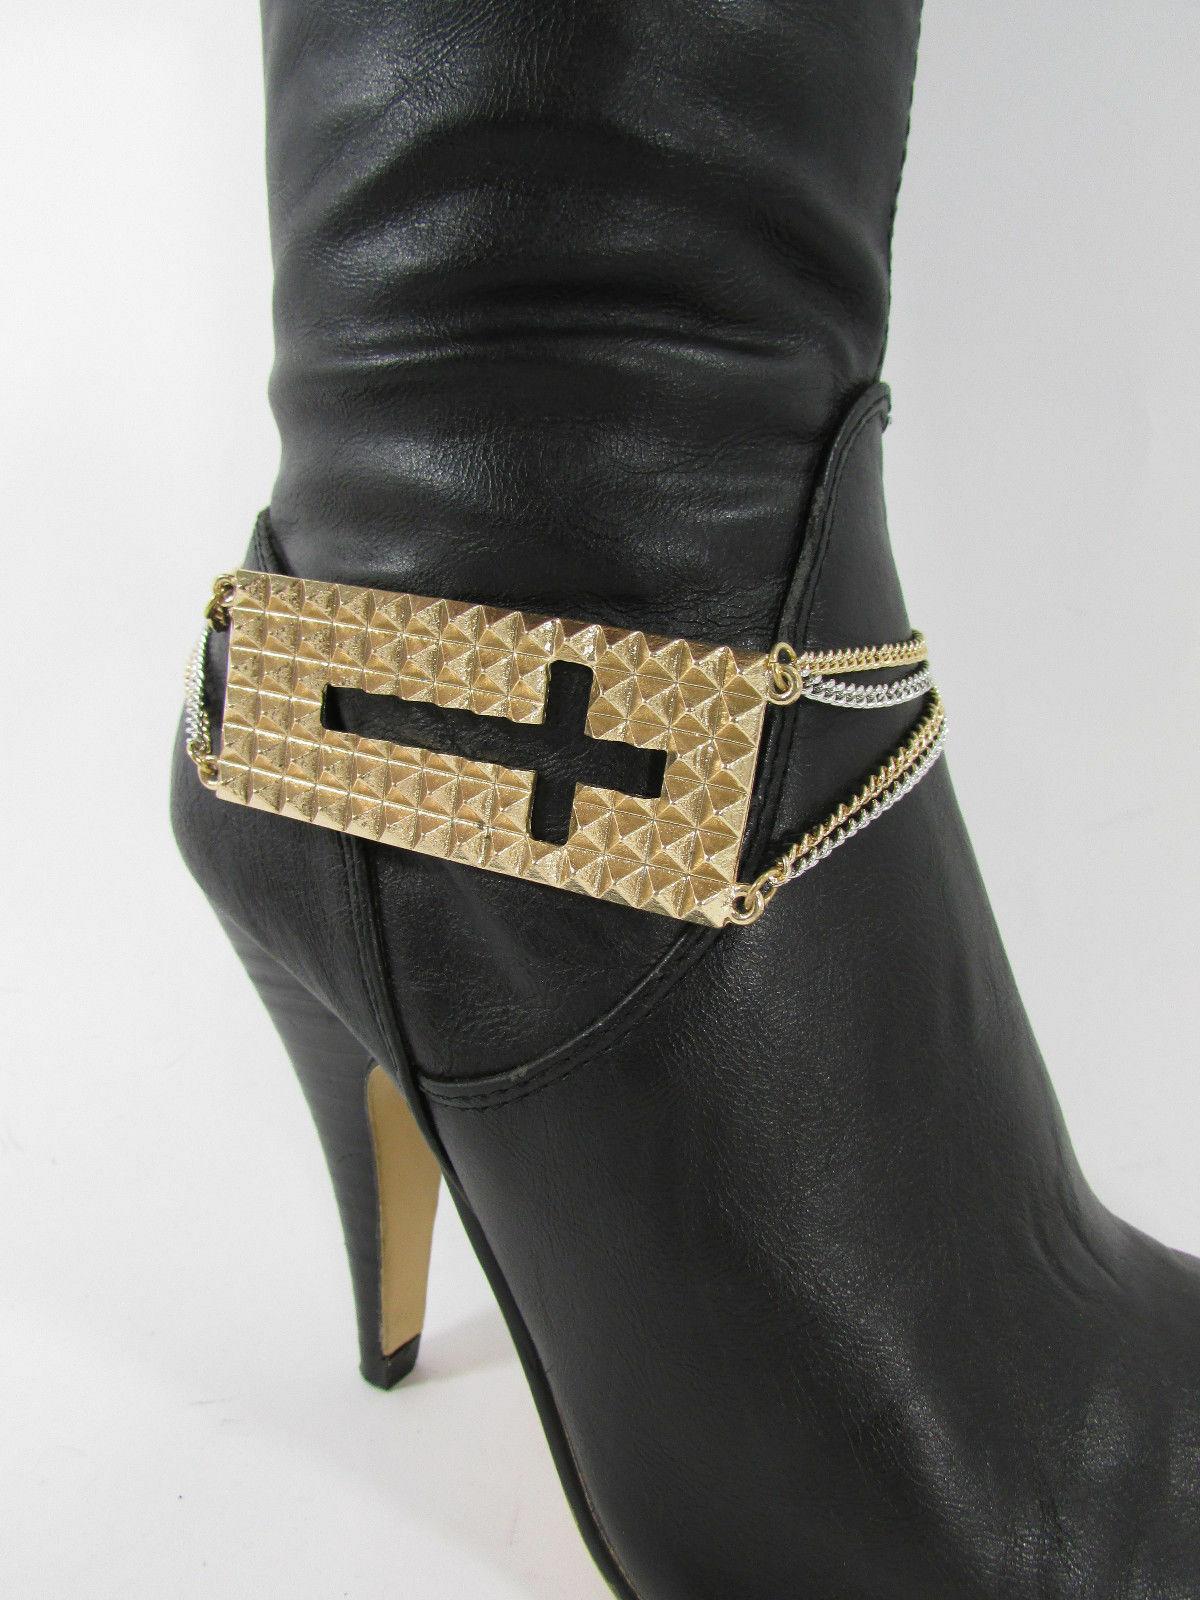 Mujer Moda Joyería Bota Brazalete Oro Placa Cruz Cadenas Zapato Bling Charm image 7